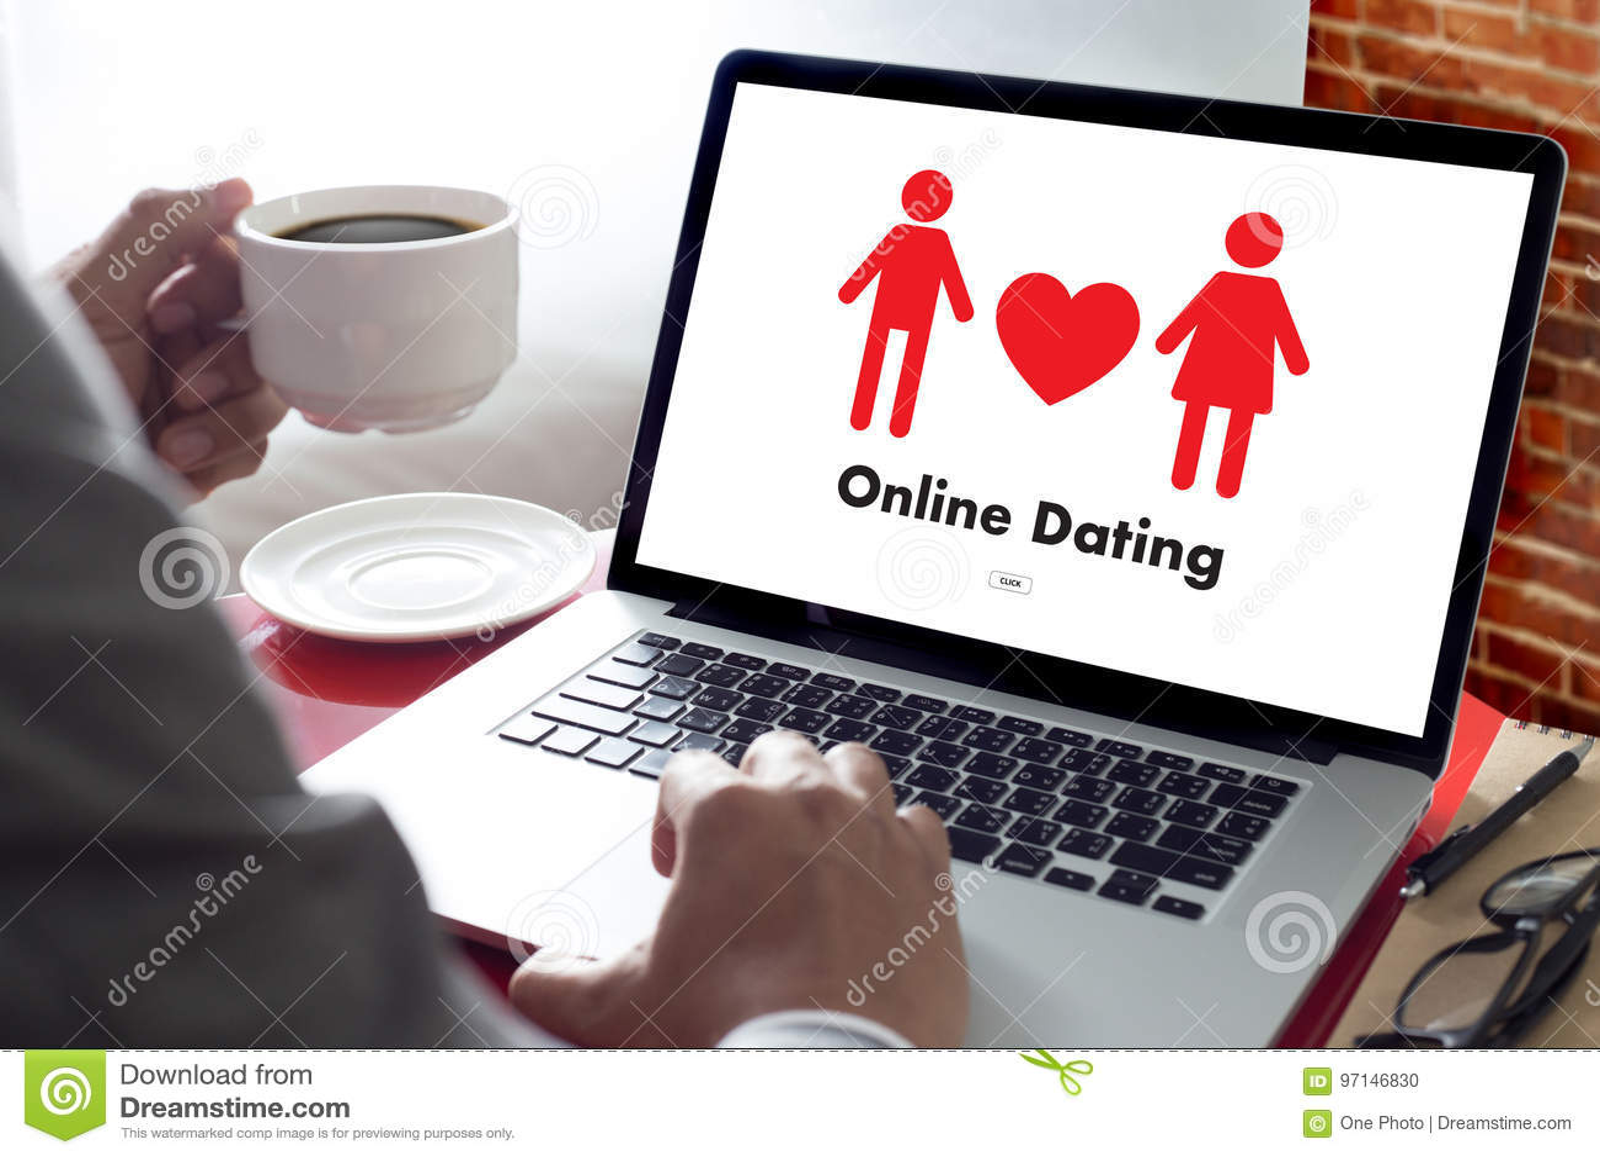 Match & online dating at matchmaker.com